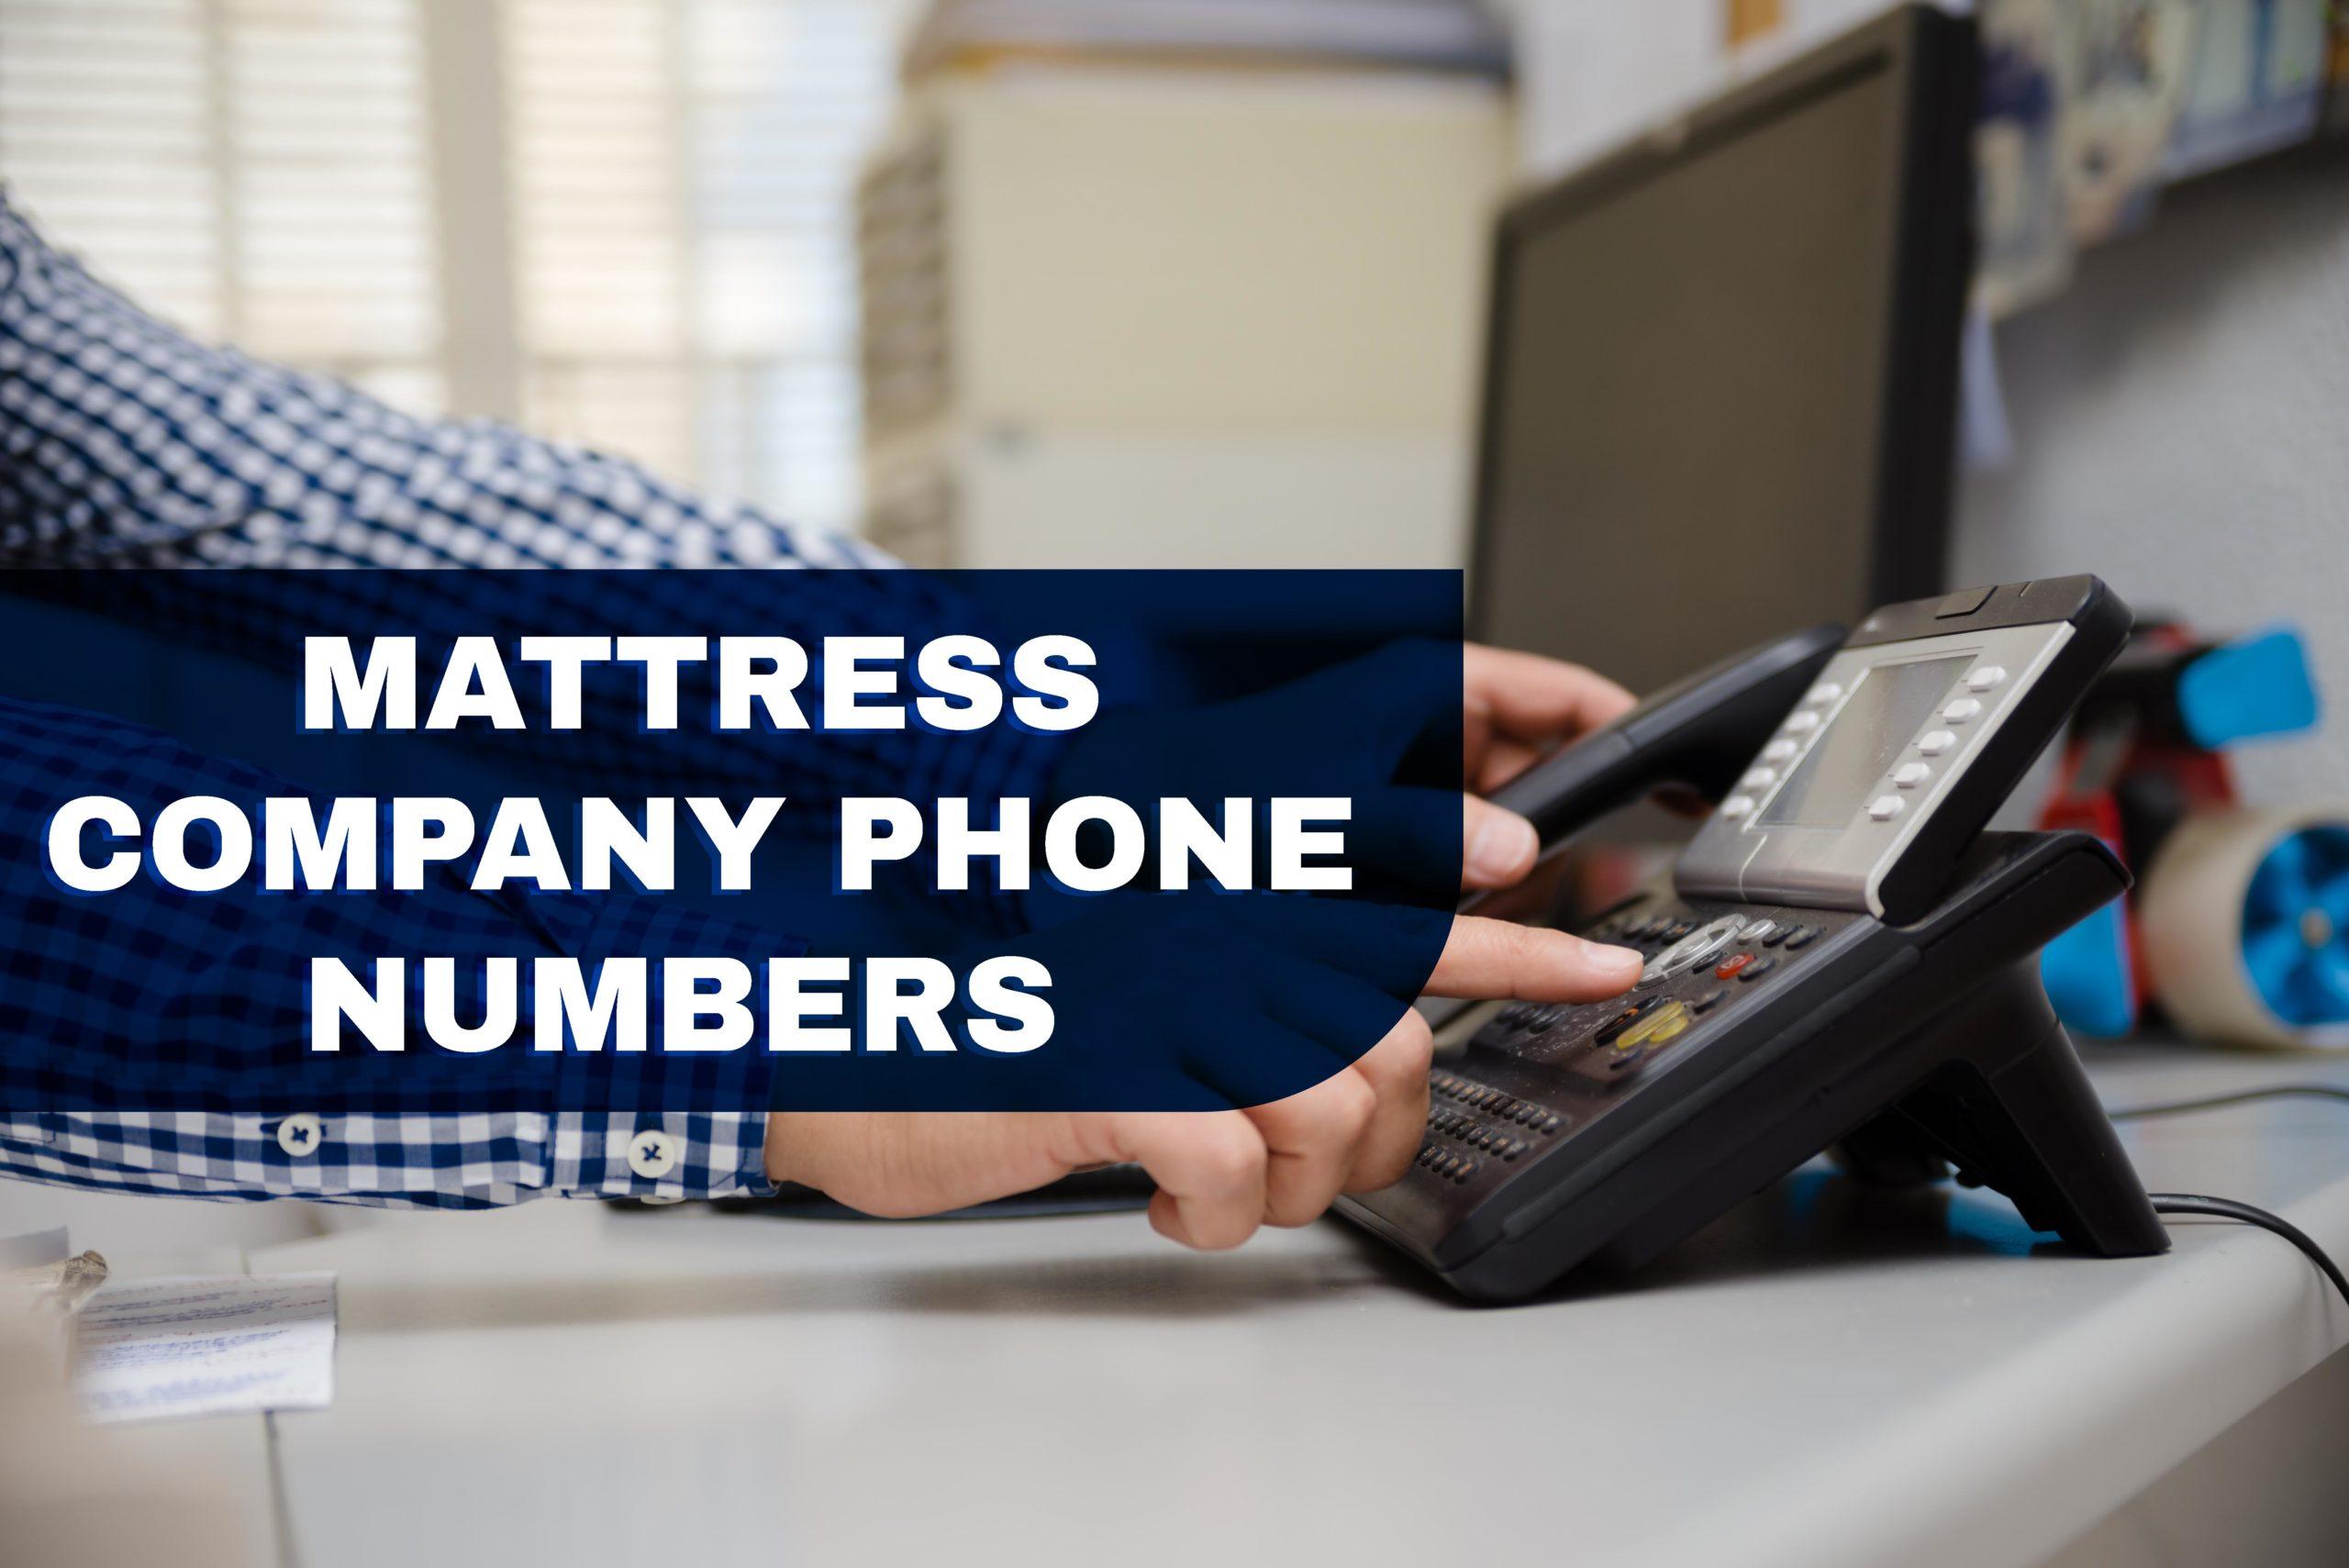 Mattress Company Phone Numbers List